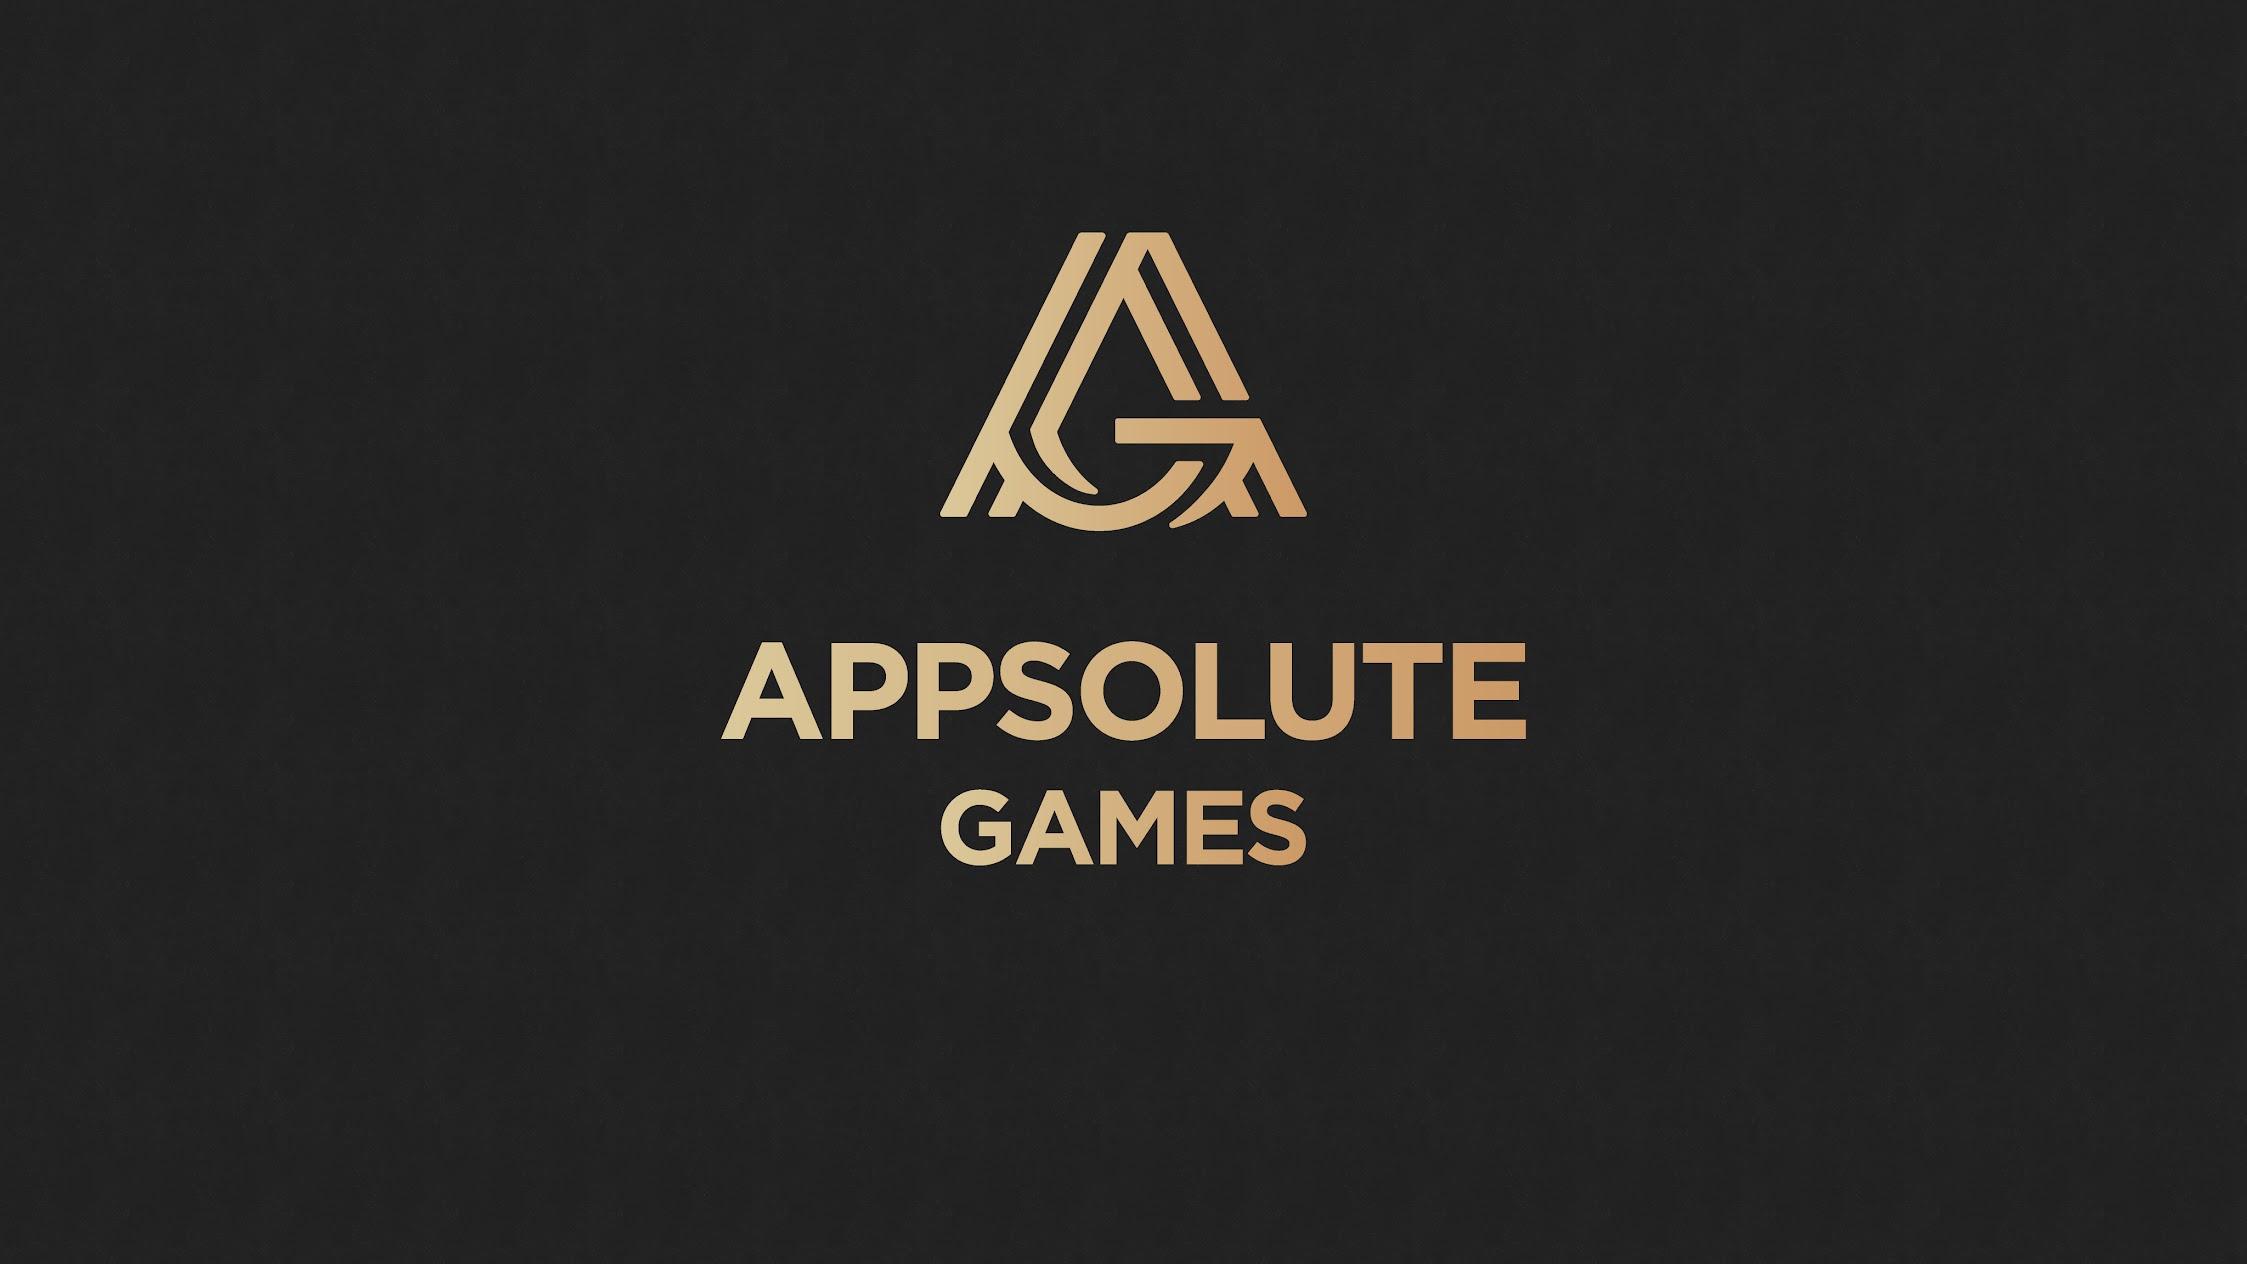 Appsolute Games